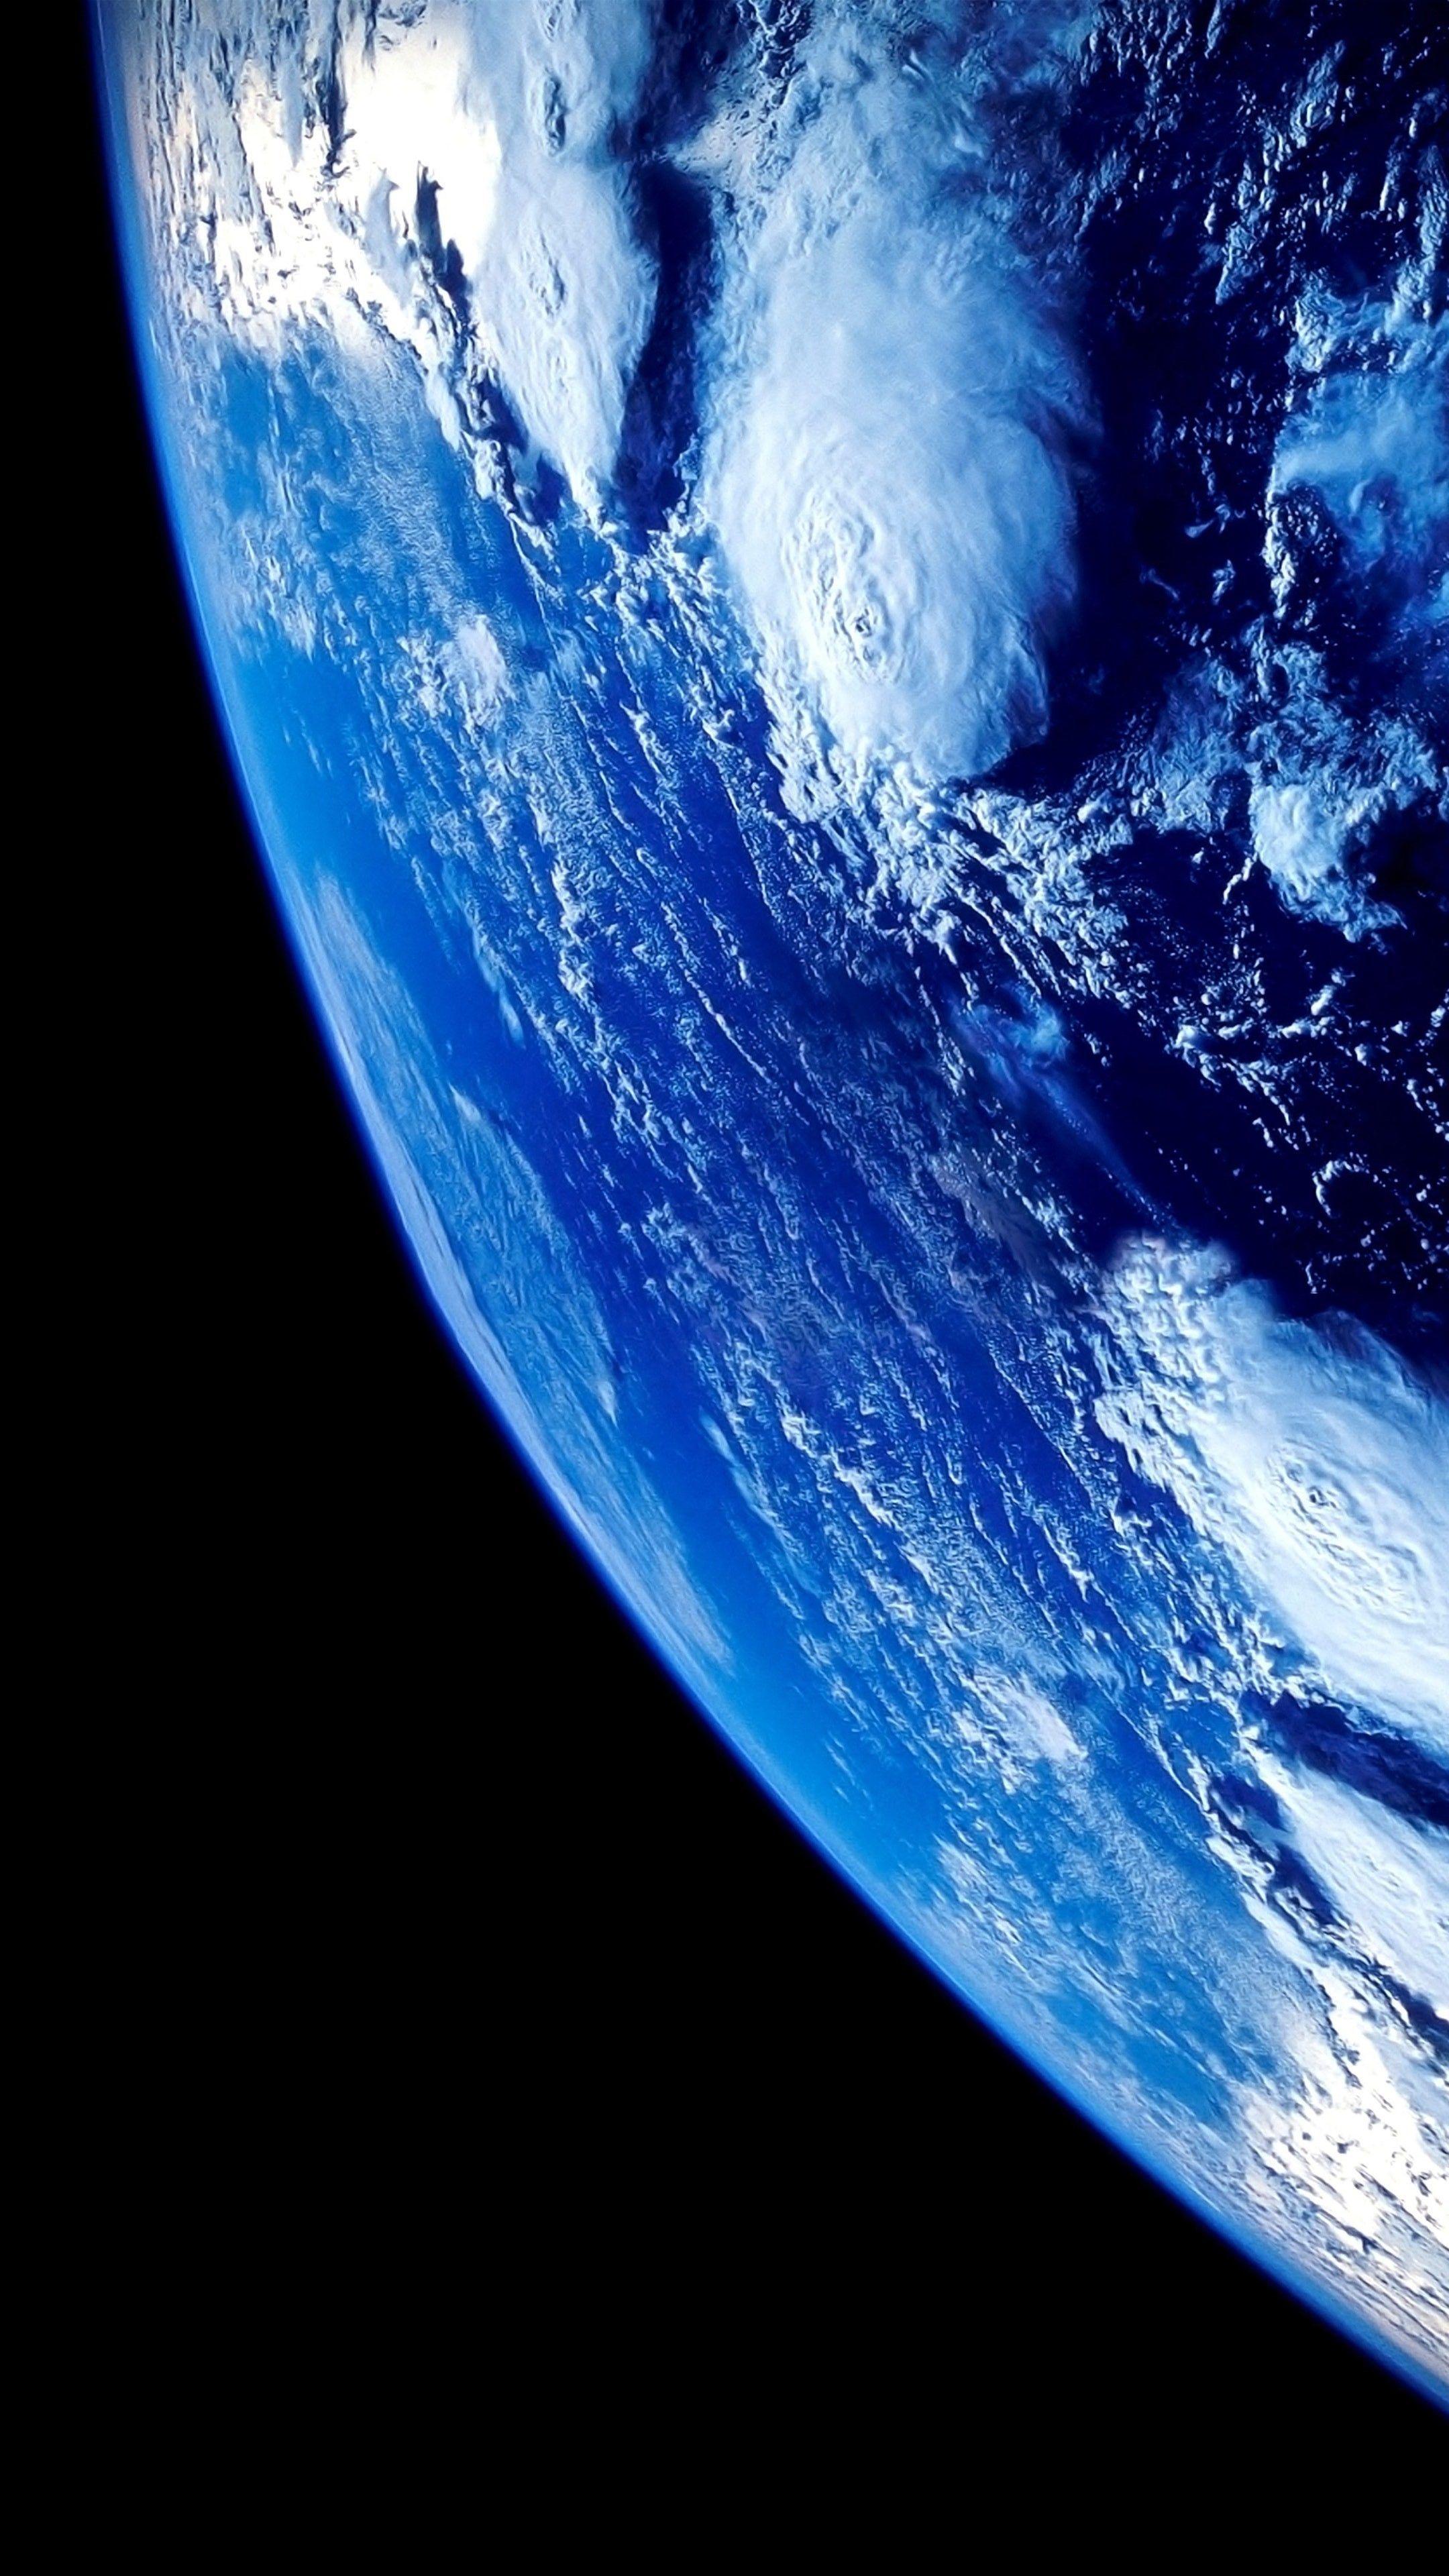 Картинки в телефон самсунг космос